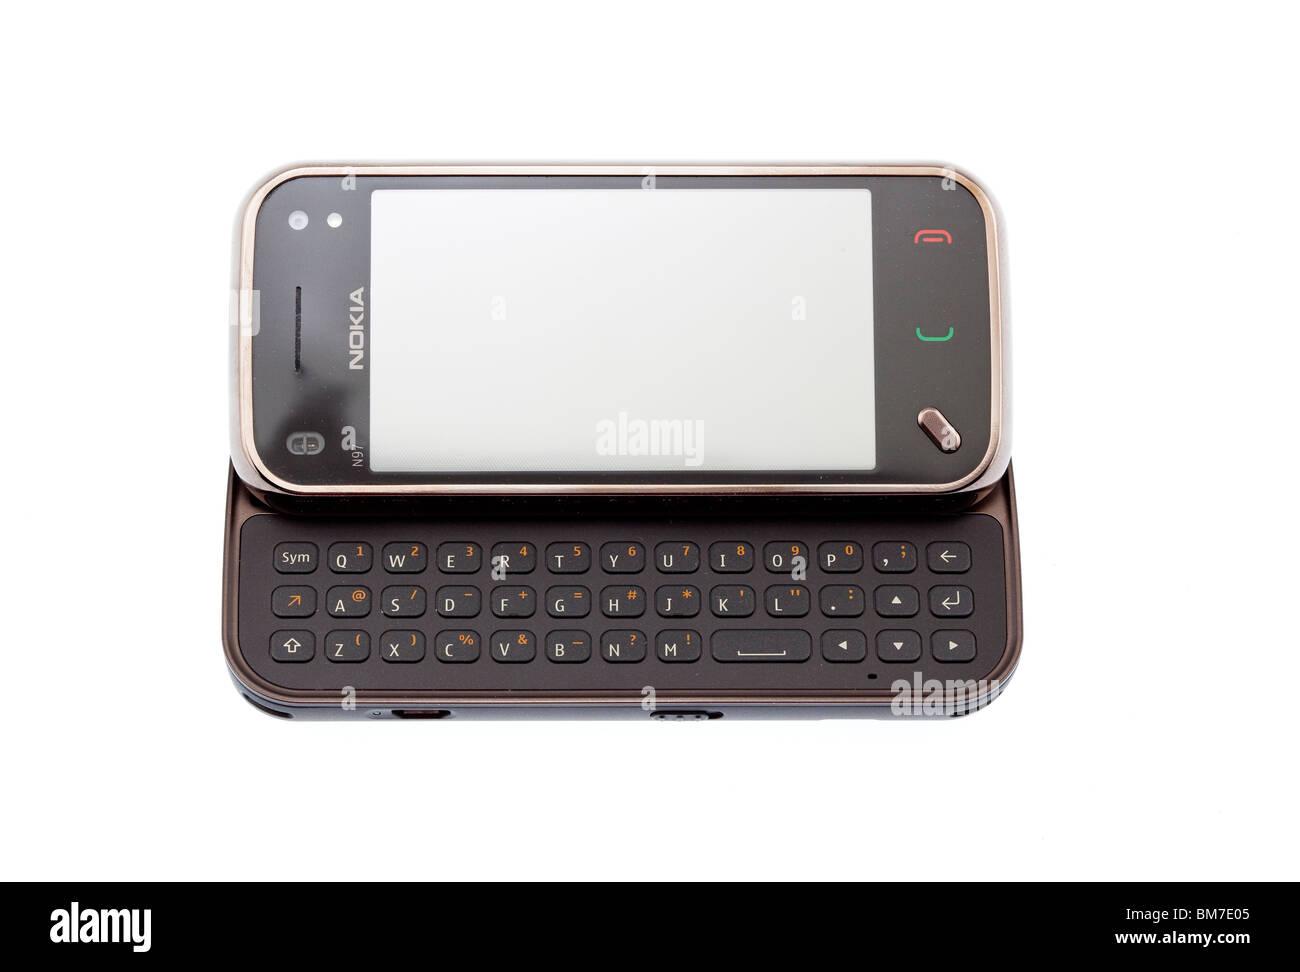 Nokia N97 Mini smartphone - Stock Image